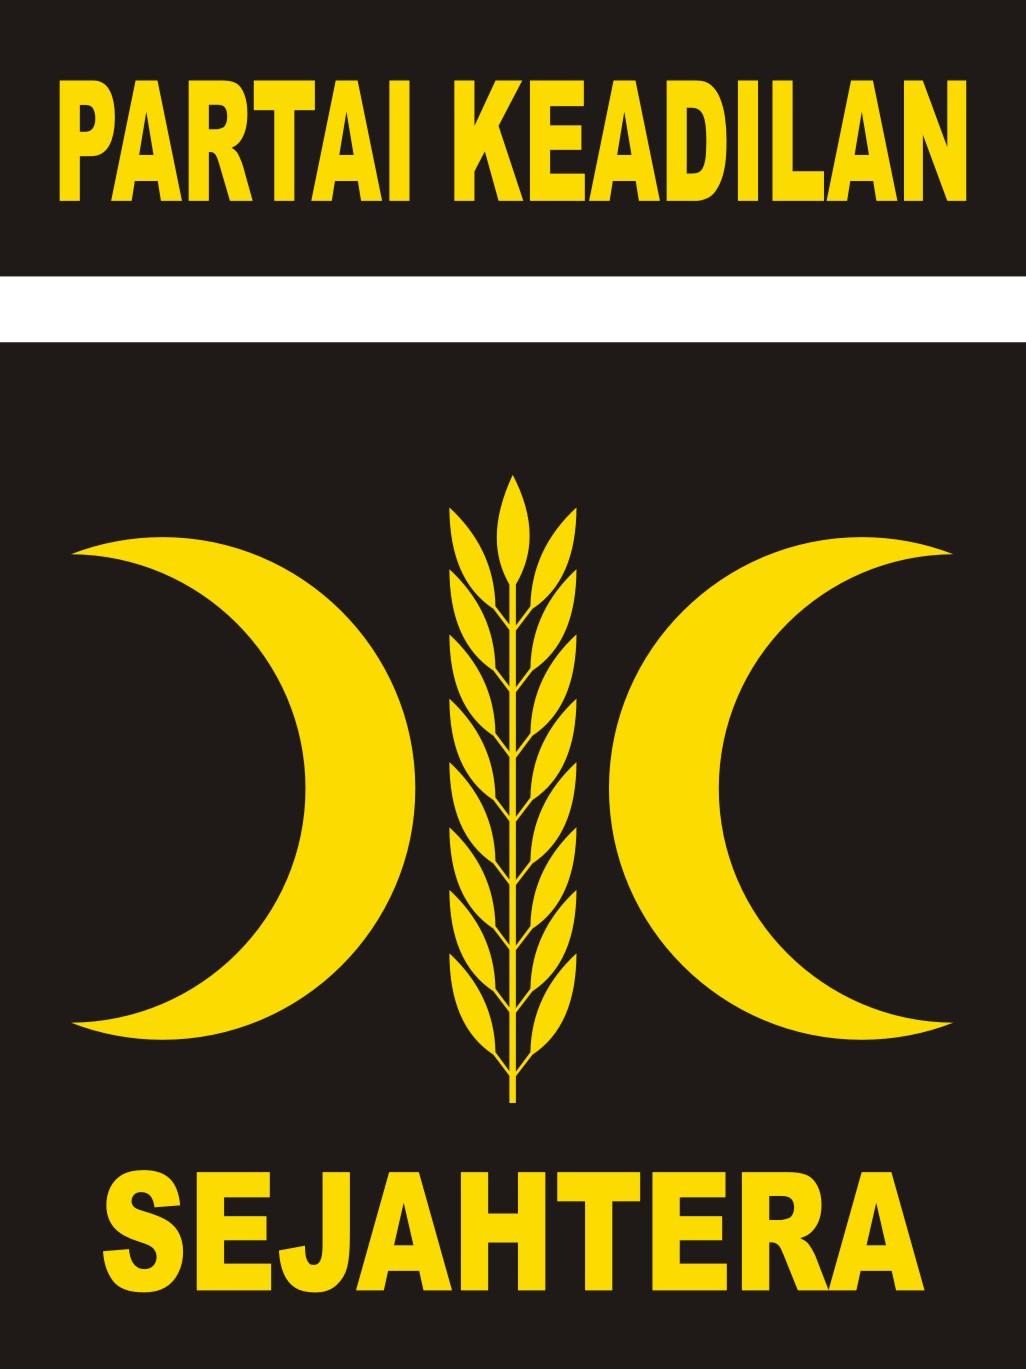 Download Logo | Vector | Gratis: Logo PKS | Partai Keadilan Sejahtera ...